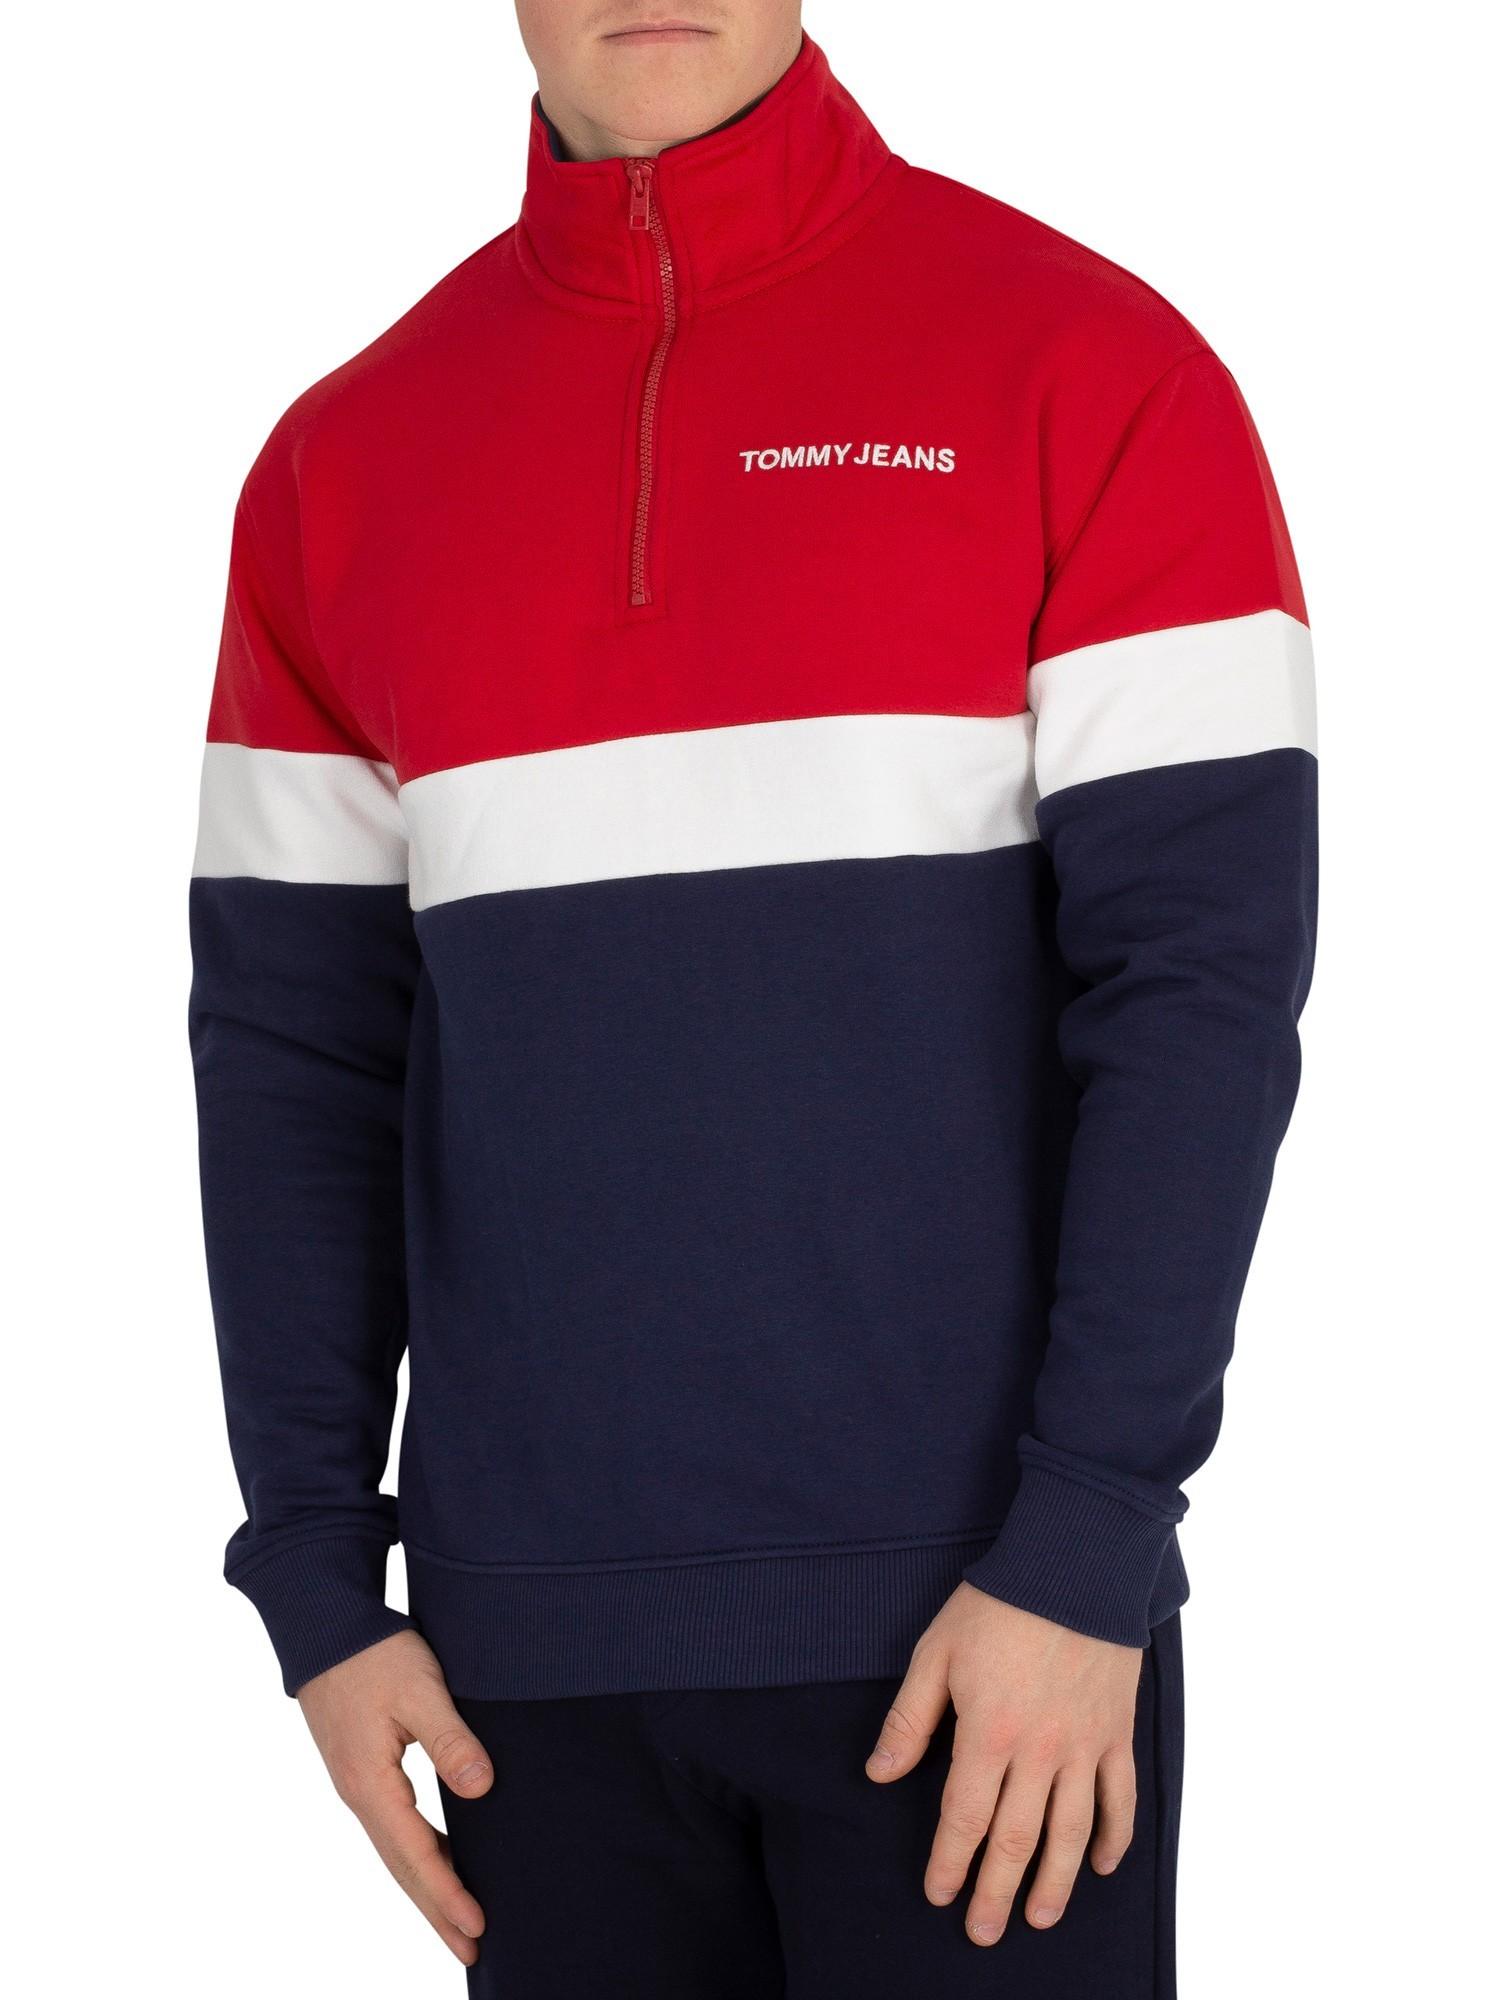 752daf42c8b434 Cheap Tommy Hilfiger Men s Clothing Sale